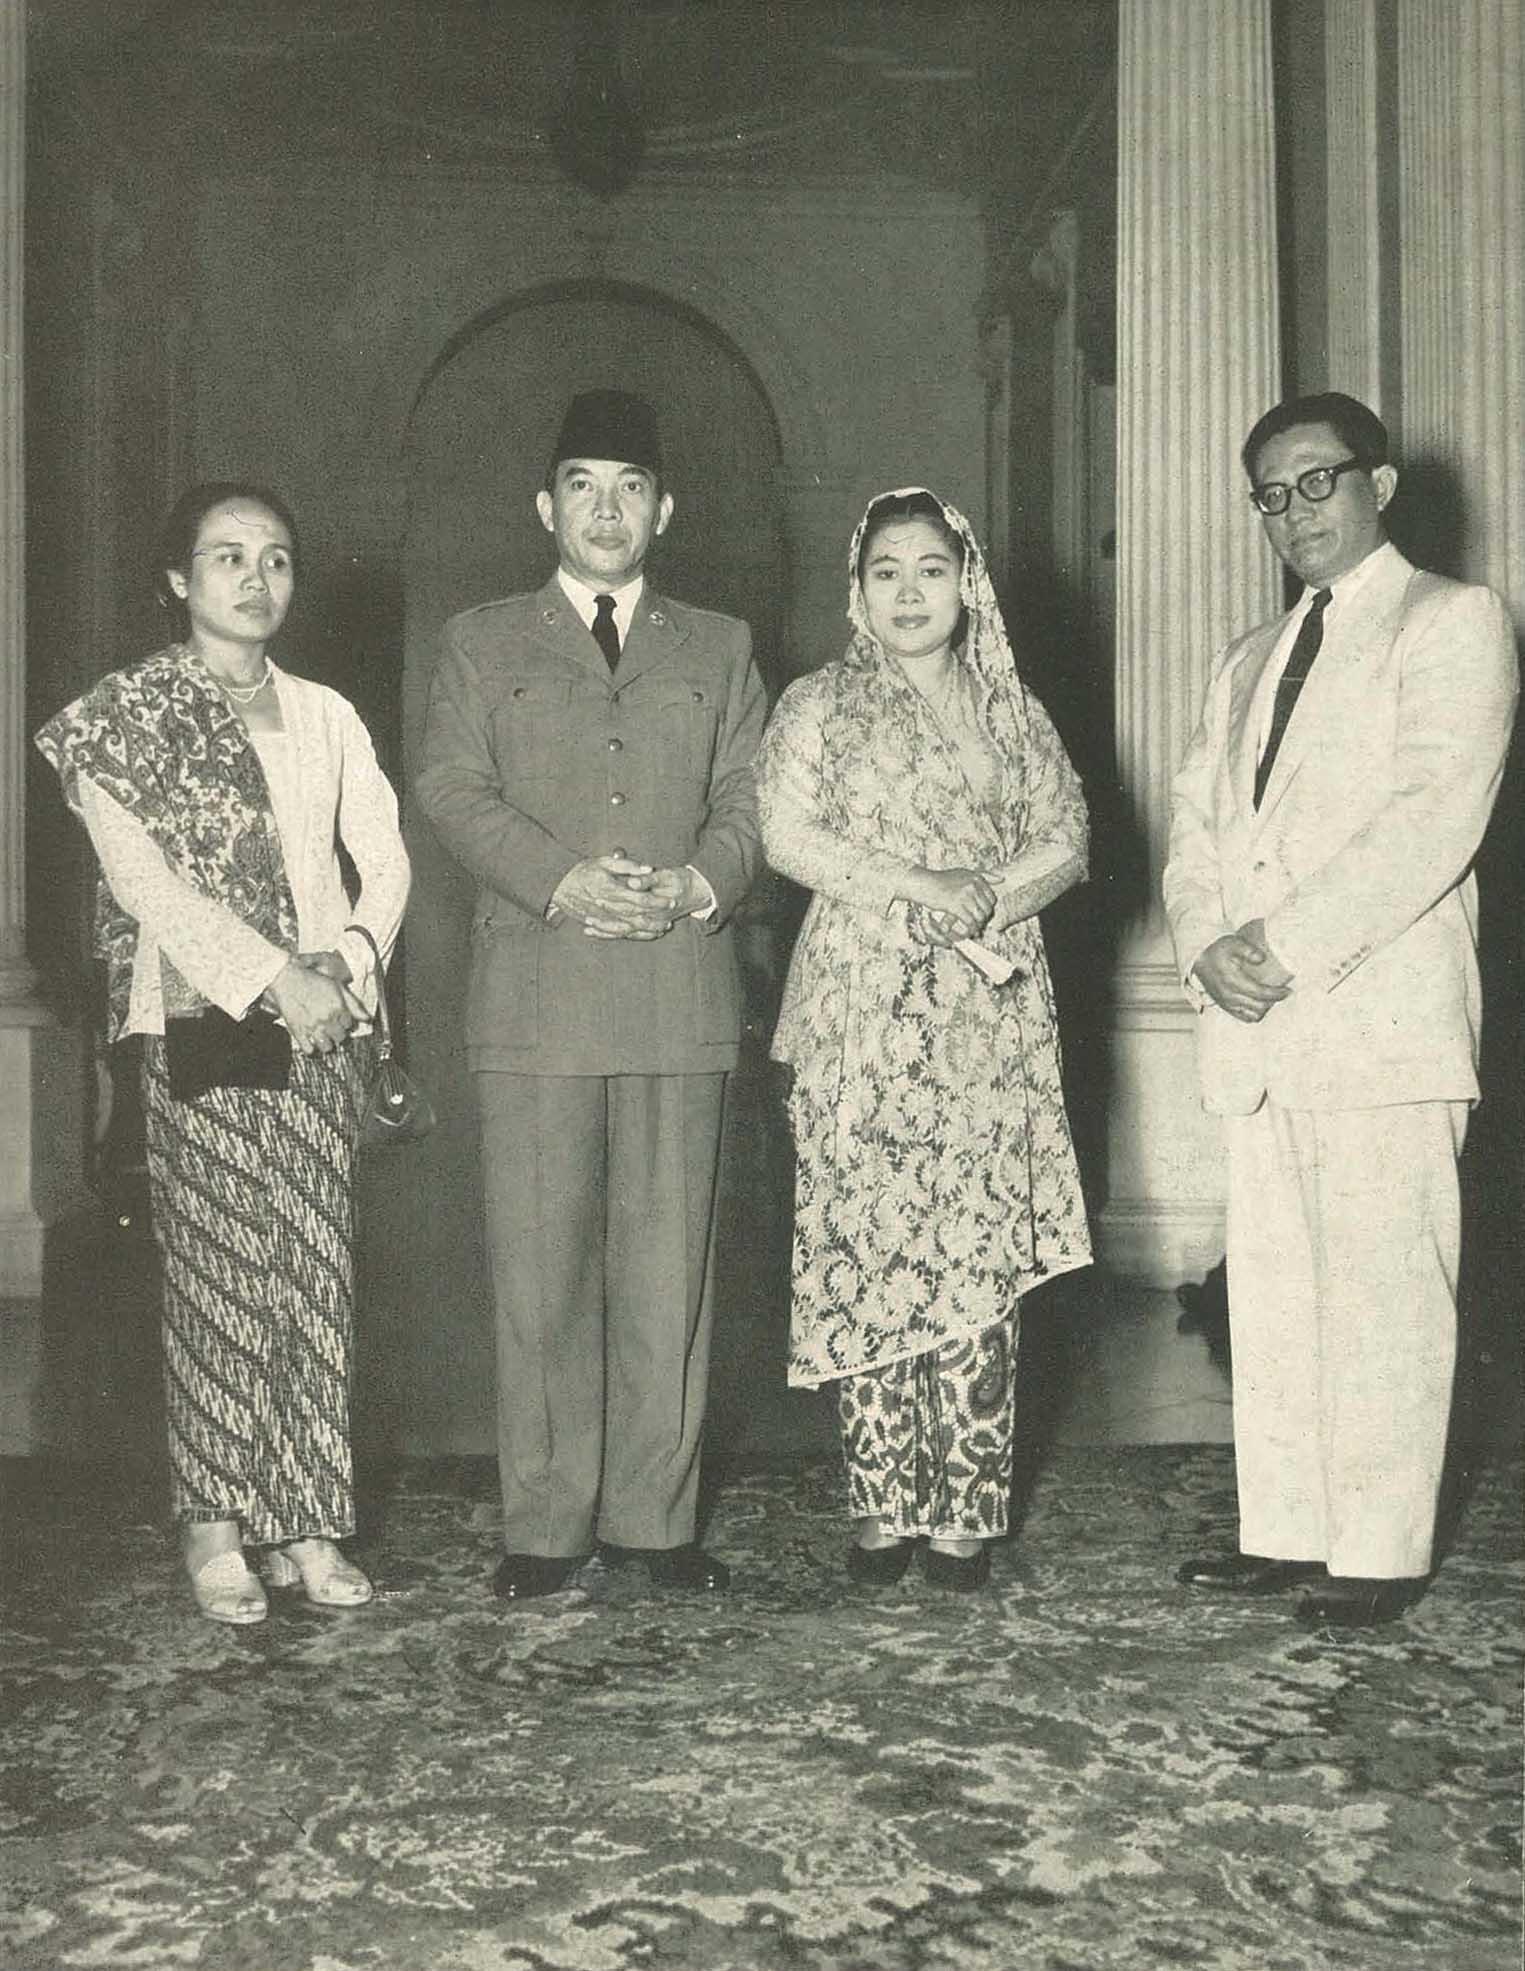 Filesukarno And Fatmawati With Mr And Mrs Mukarto Wanita Di Indonesia P